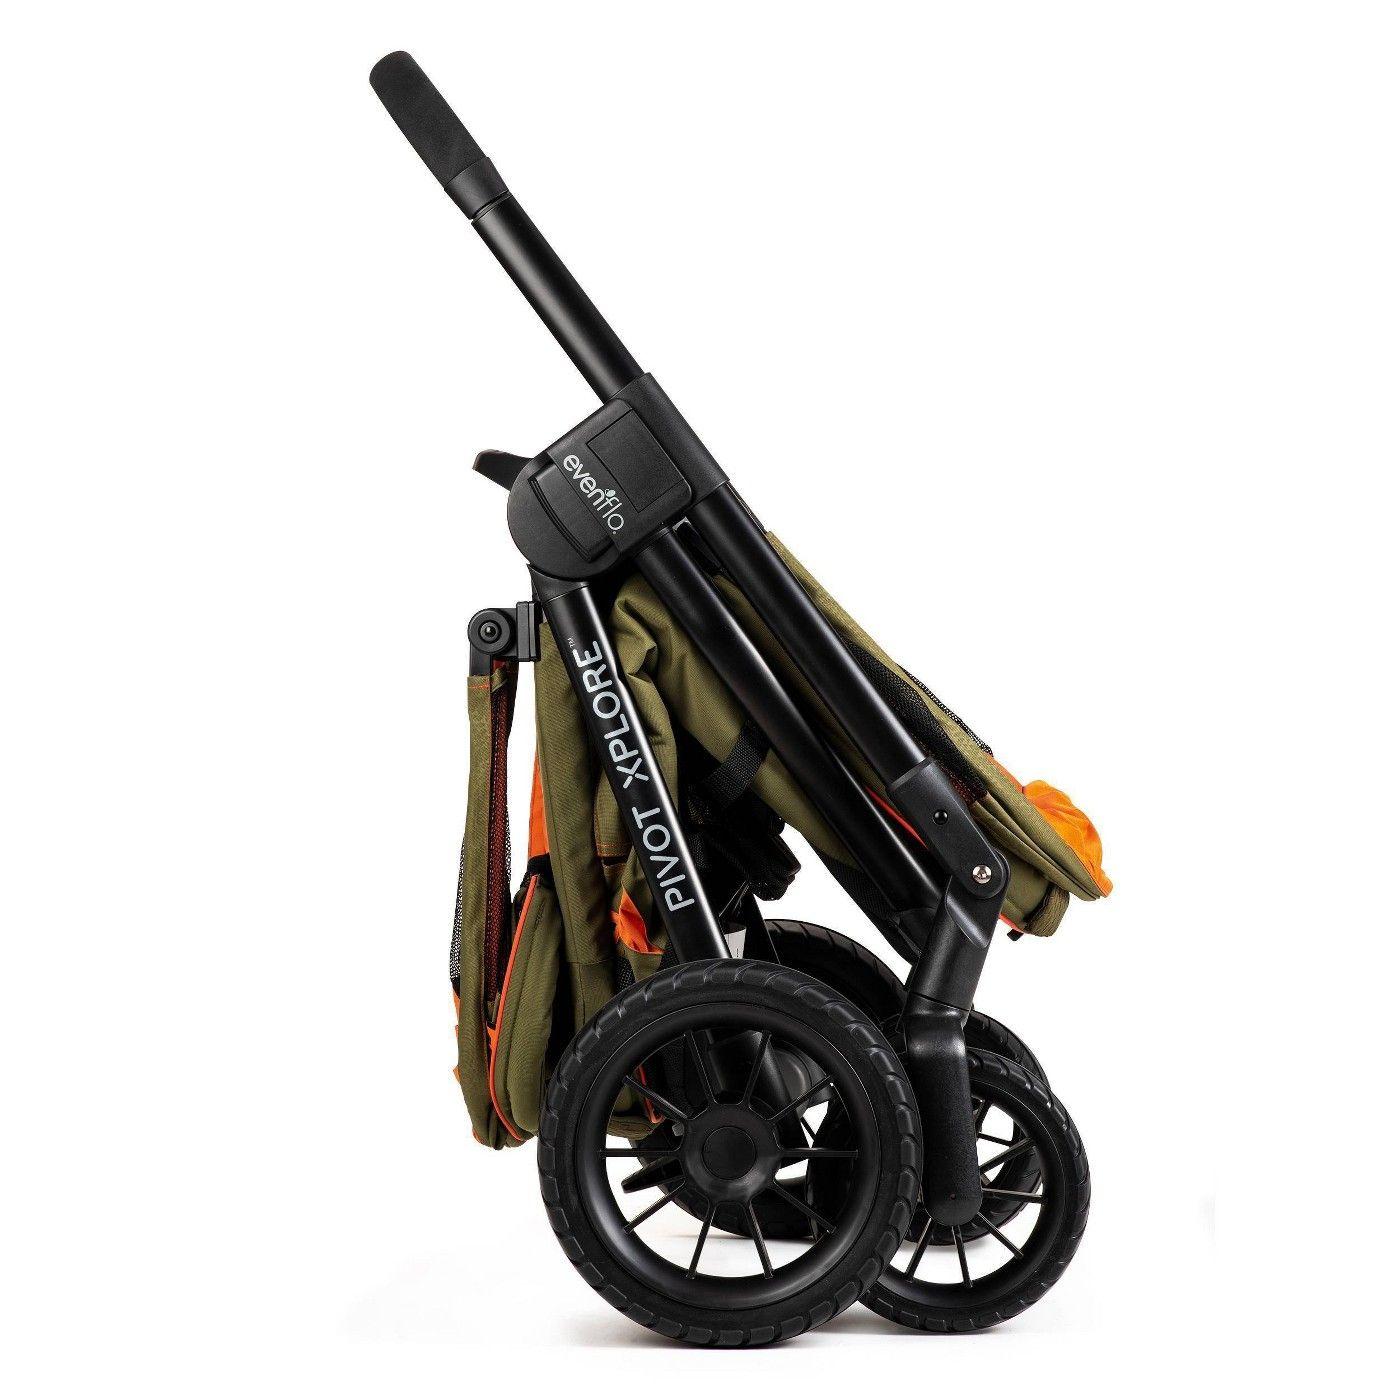 Evenflo Pivot Xplore AllTerrain Double Stroller Wagon in